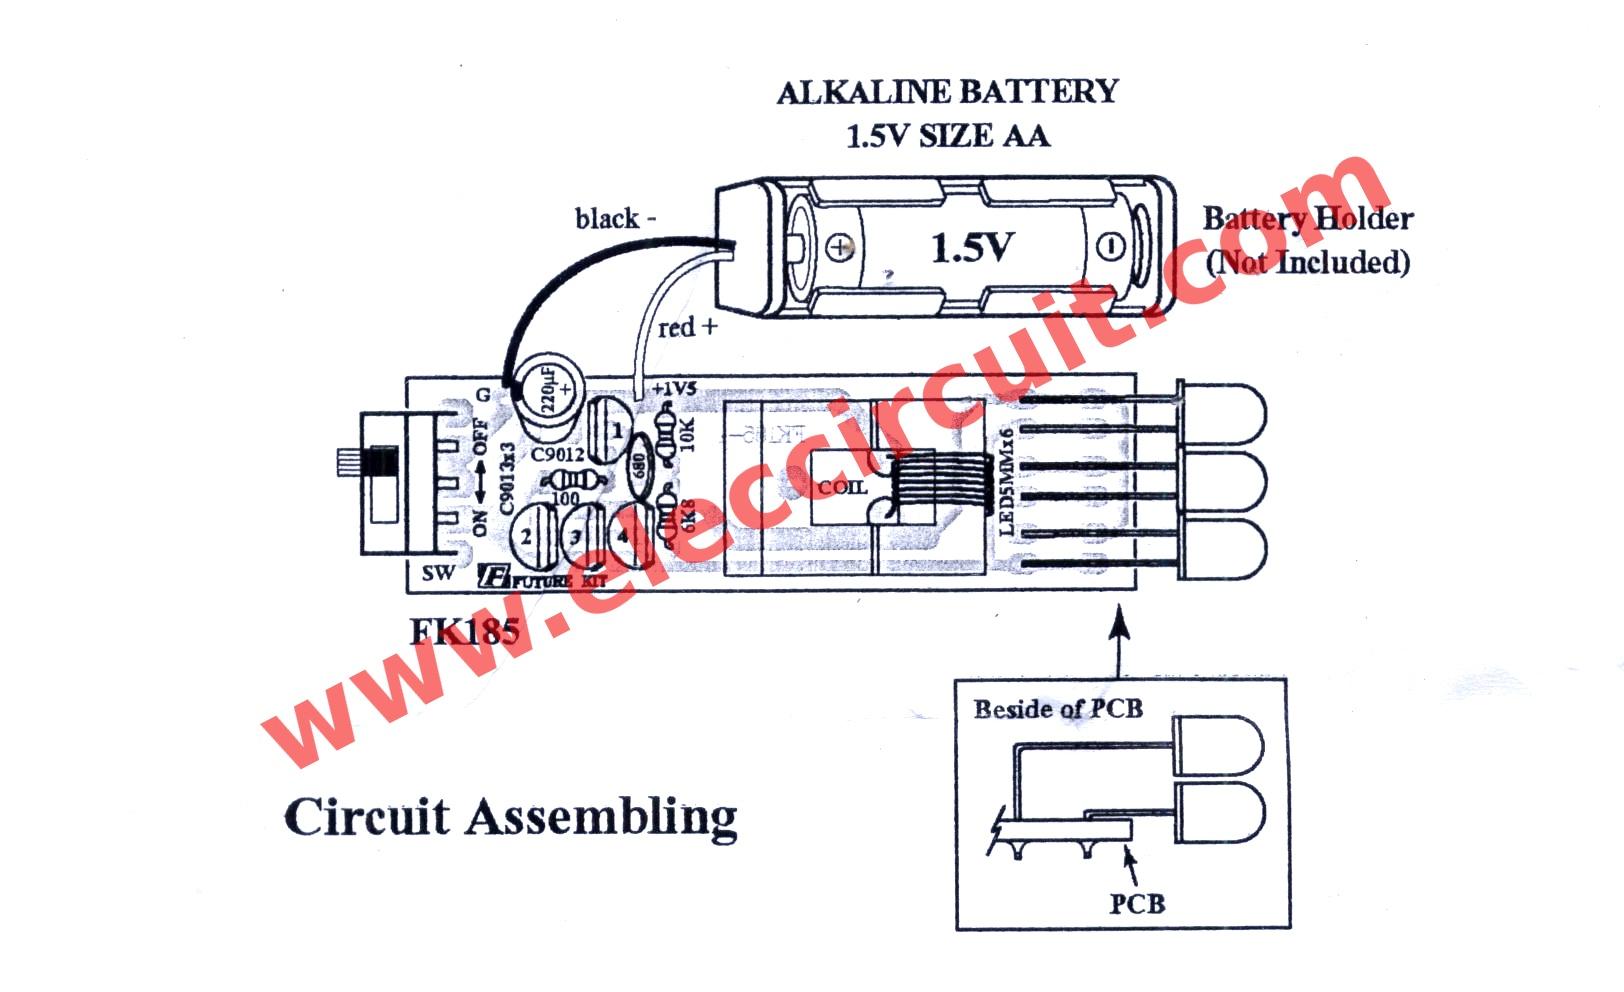 hight resolution of led flashlight wiring diagram schema diagram databasefigure 1 simple high power led flashlights the circuit diagram